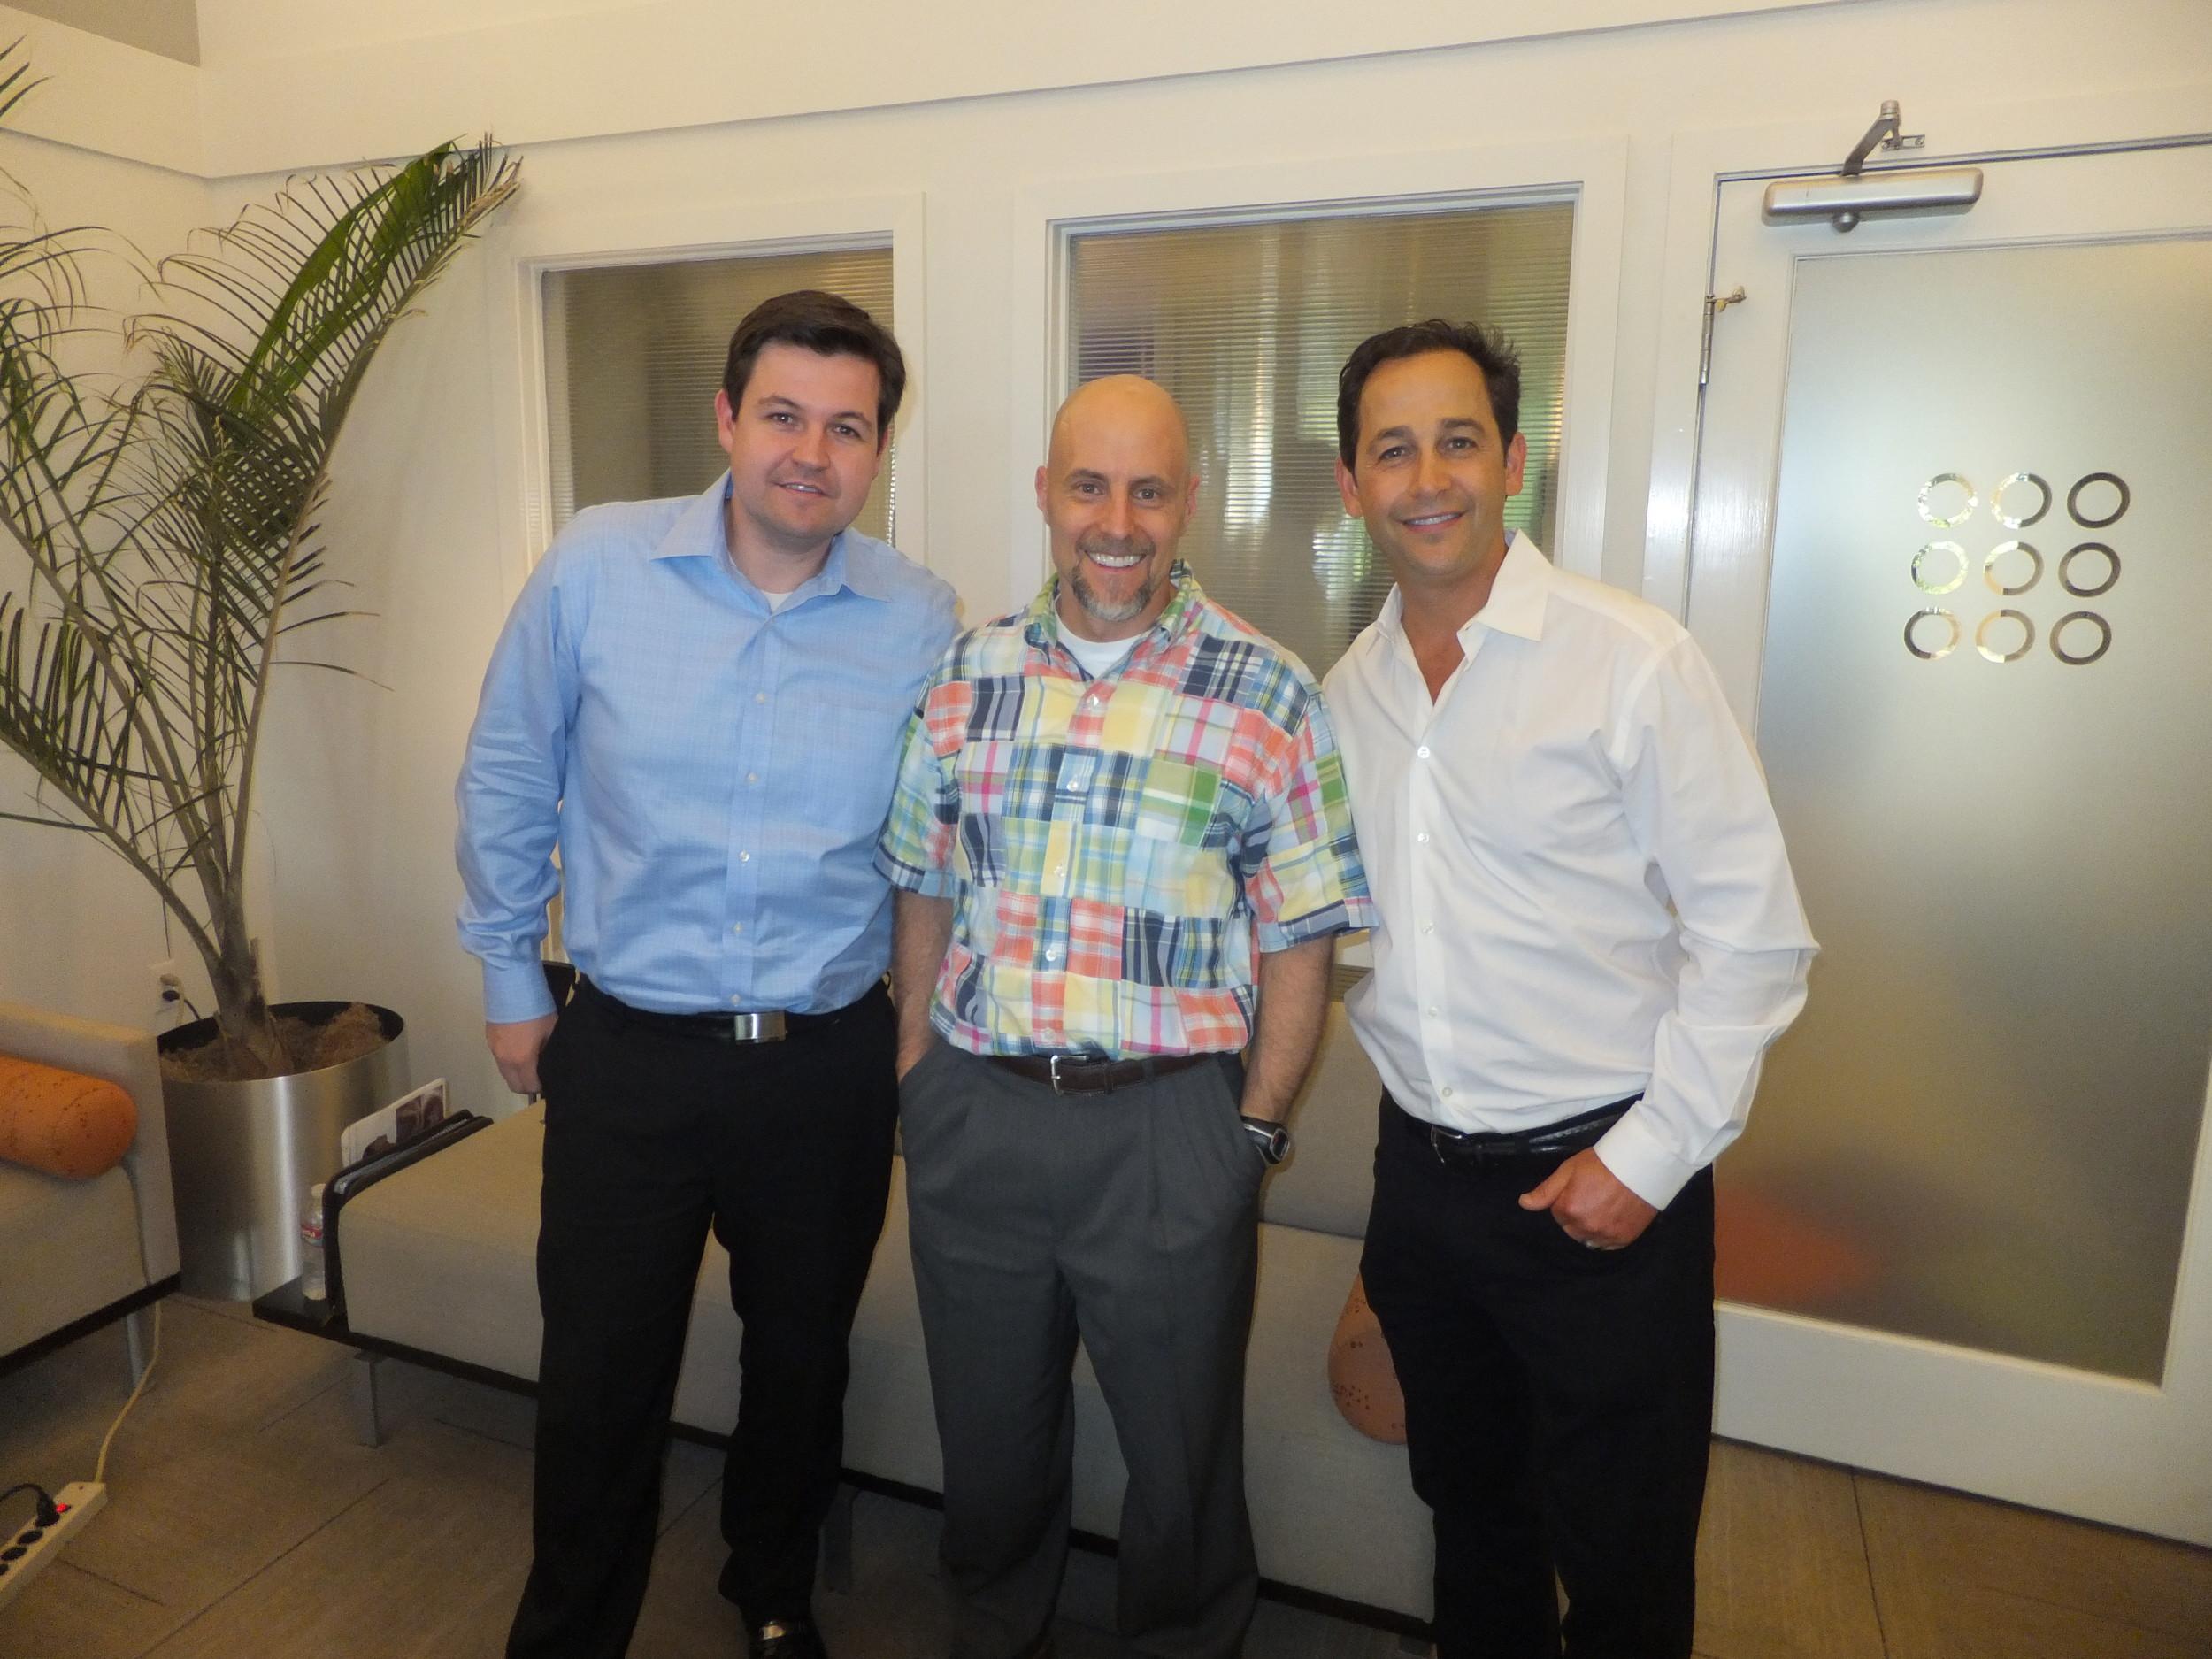 Drs. Timothy Brunson, Nick Salome, and Randy Kunik